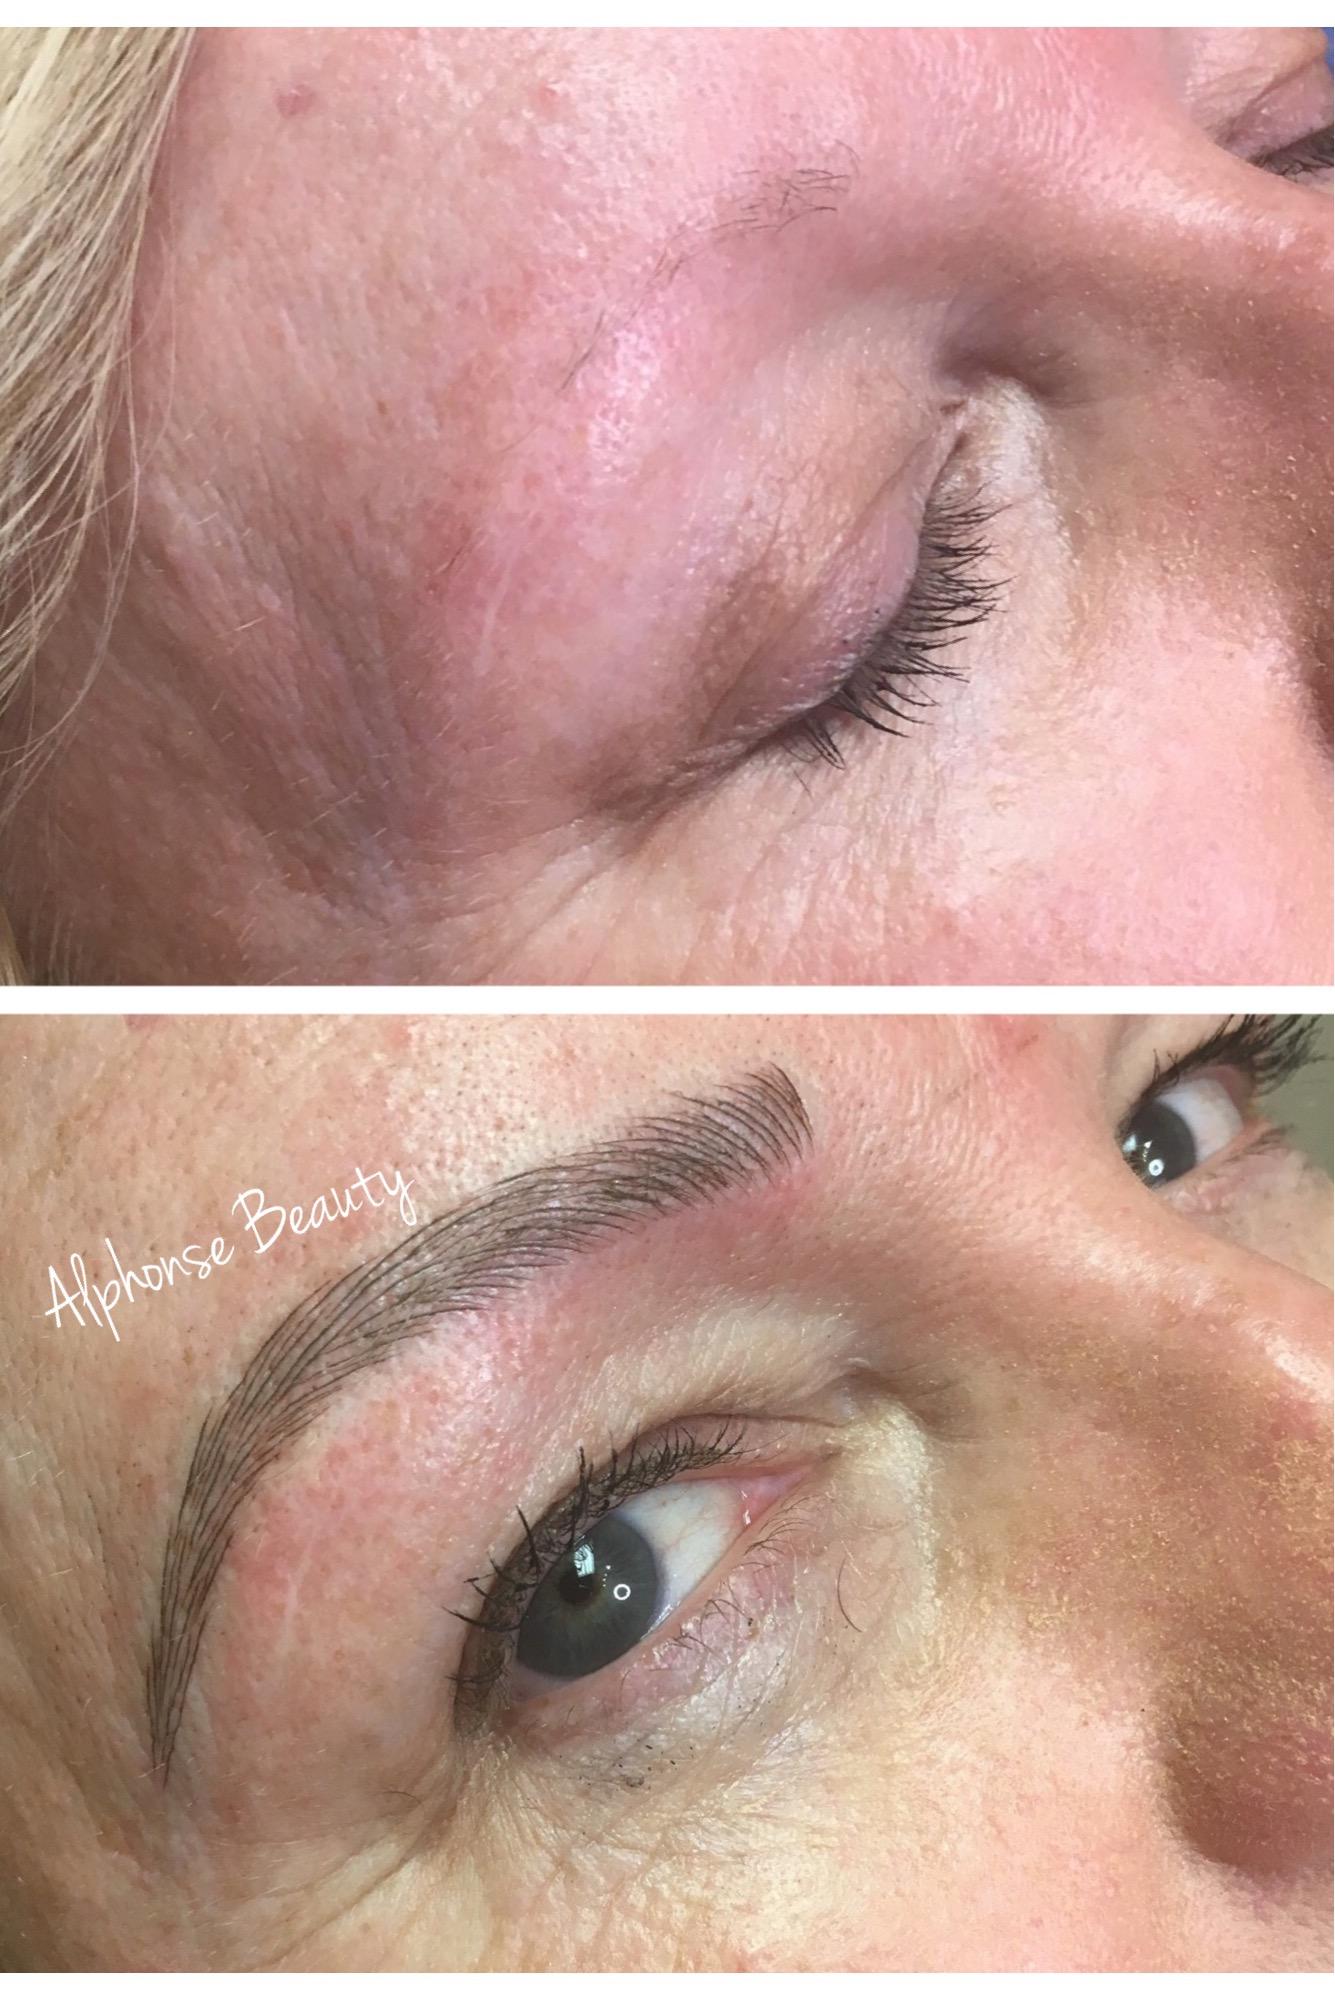 Eyebrow reconstruction using cosmetic tattoo Microblading procedure